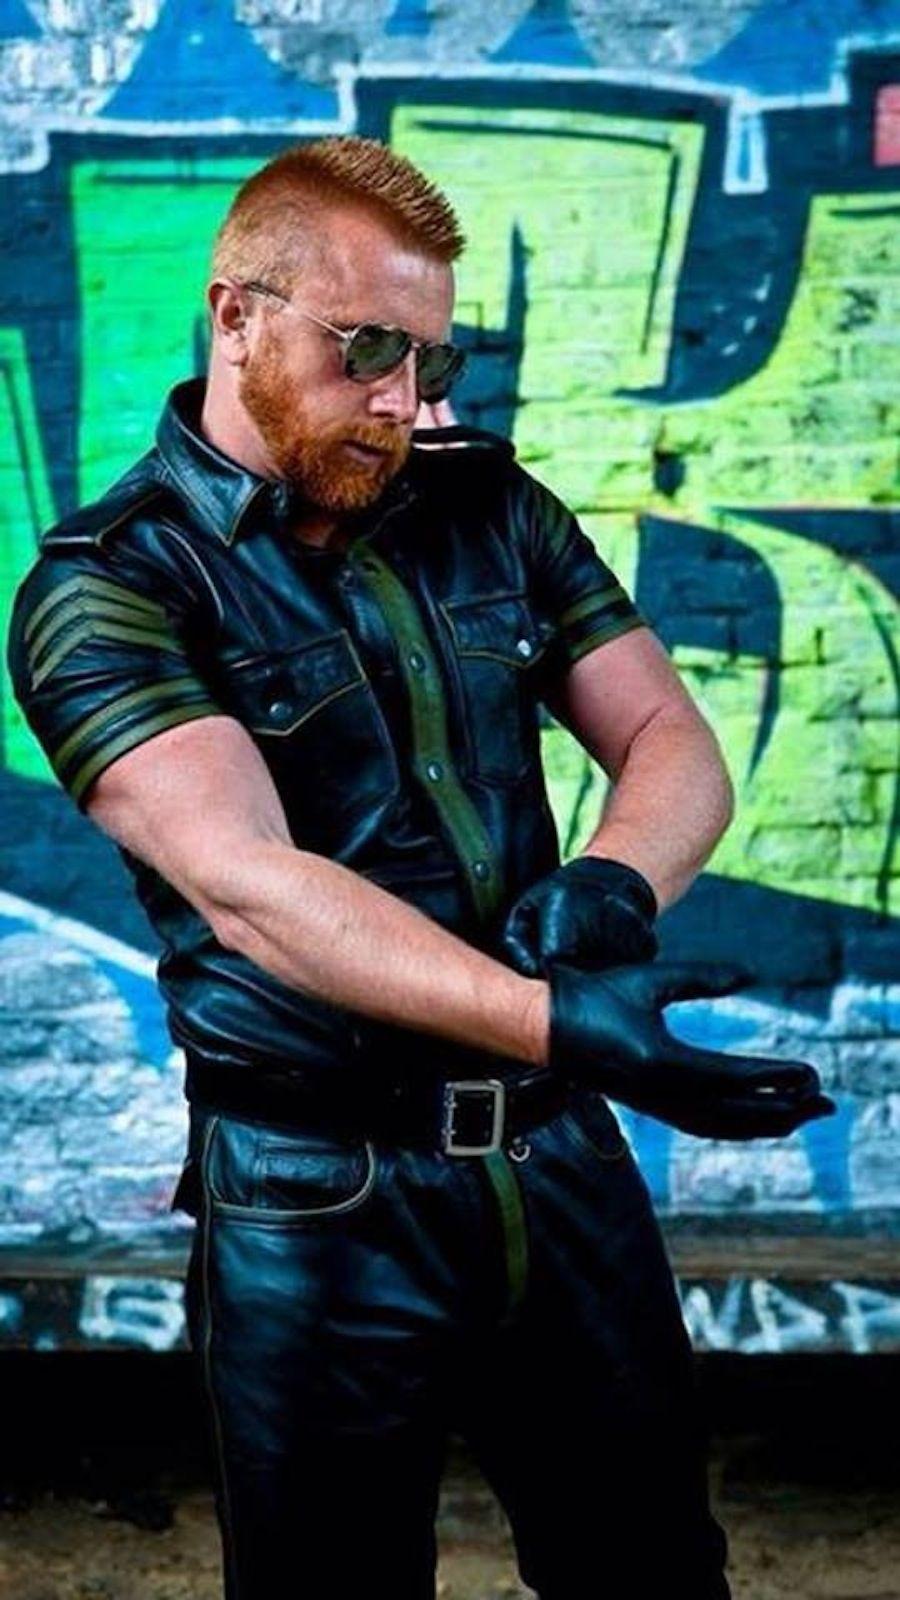 Black leather uniform gloves - Fm Leather Glovesguys Leatherleather Prideleather Uniformblack